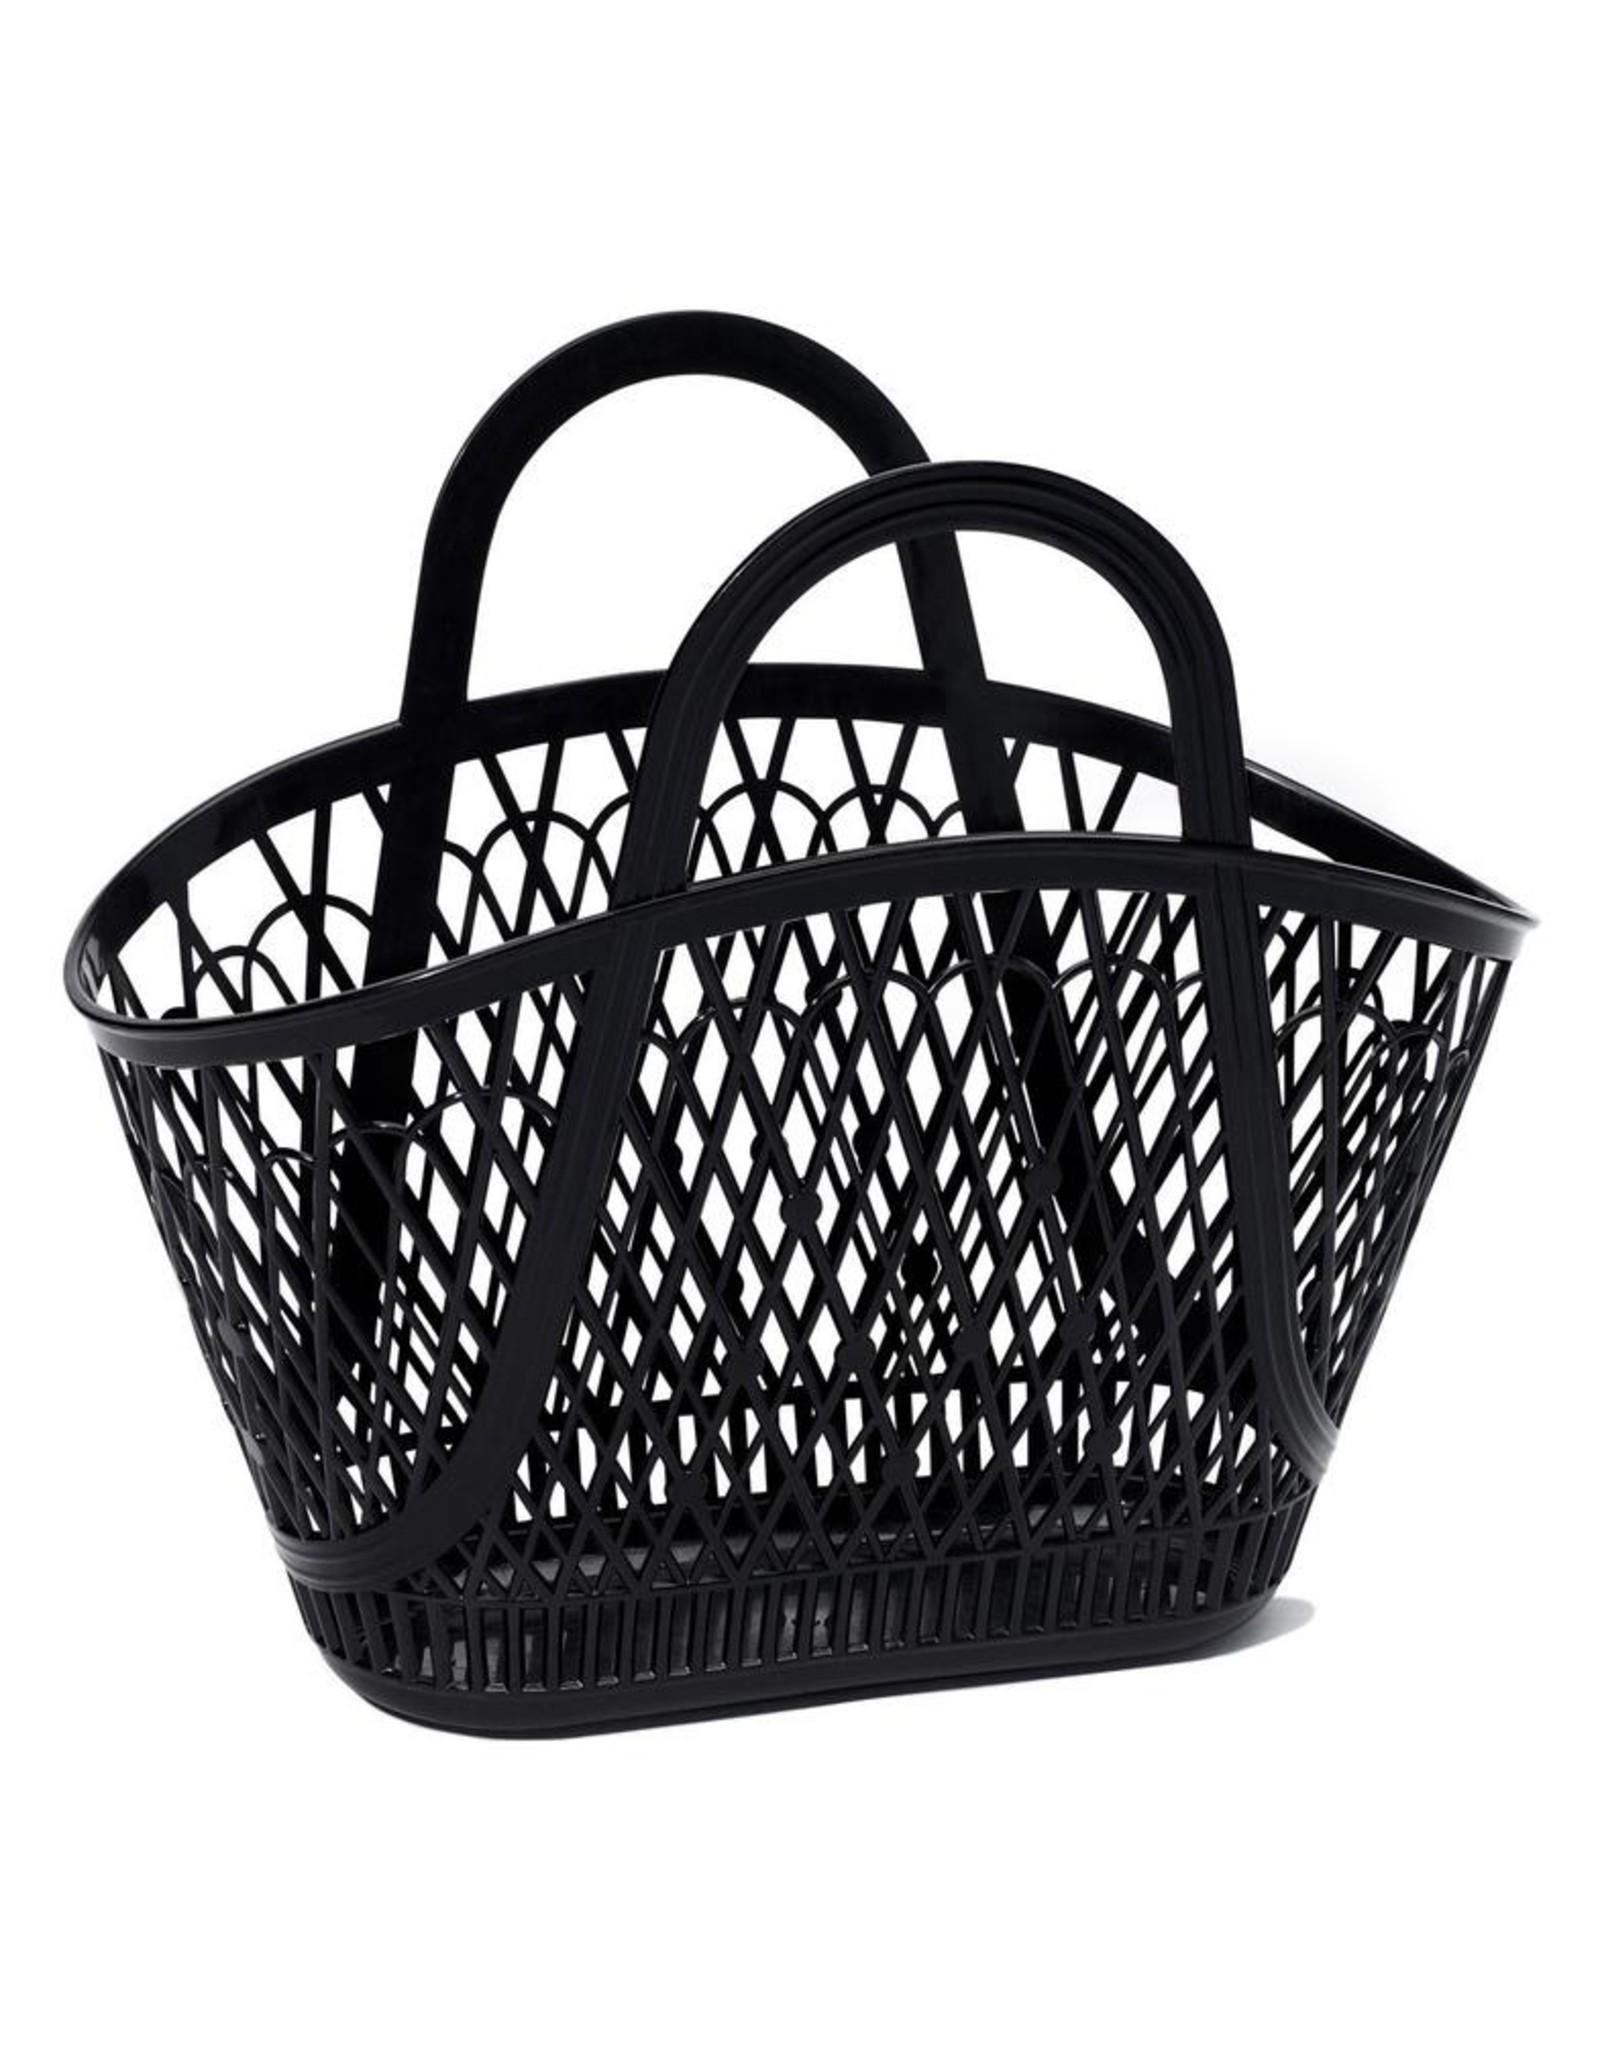 Sunjellies Sunjellies Betty Basket - Black